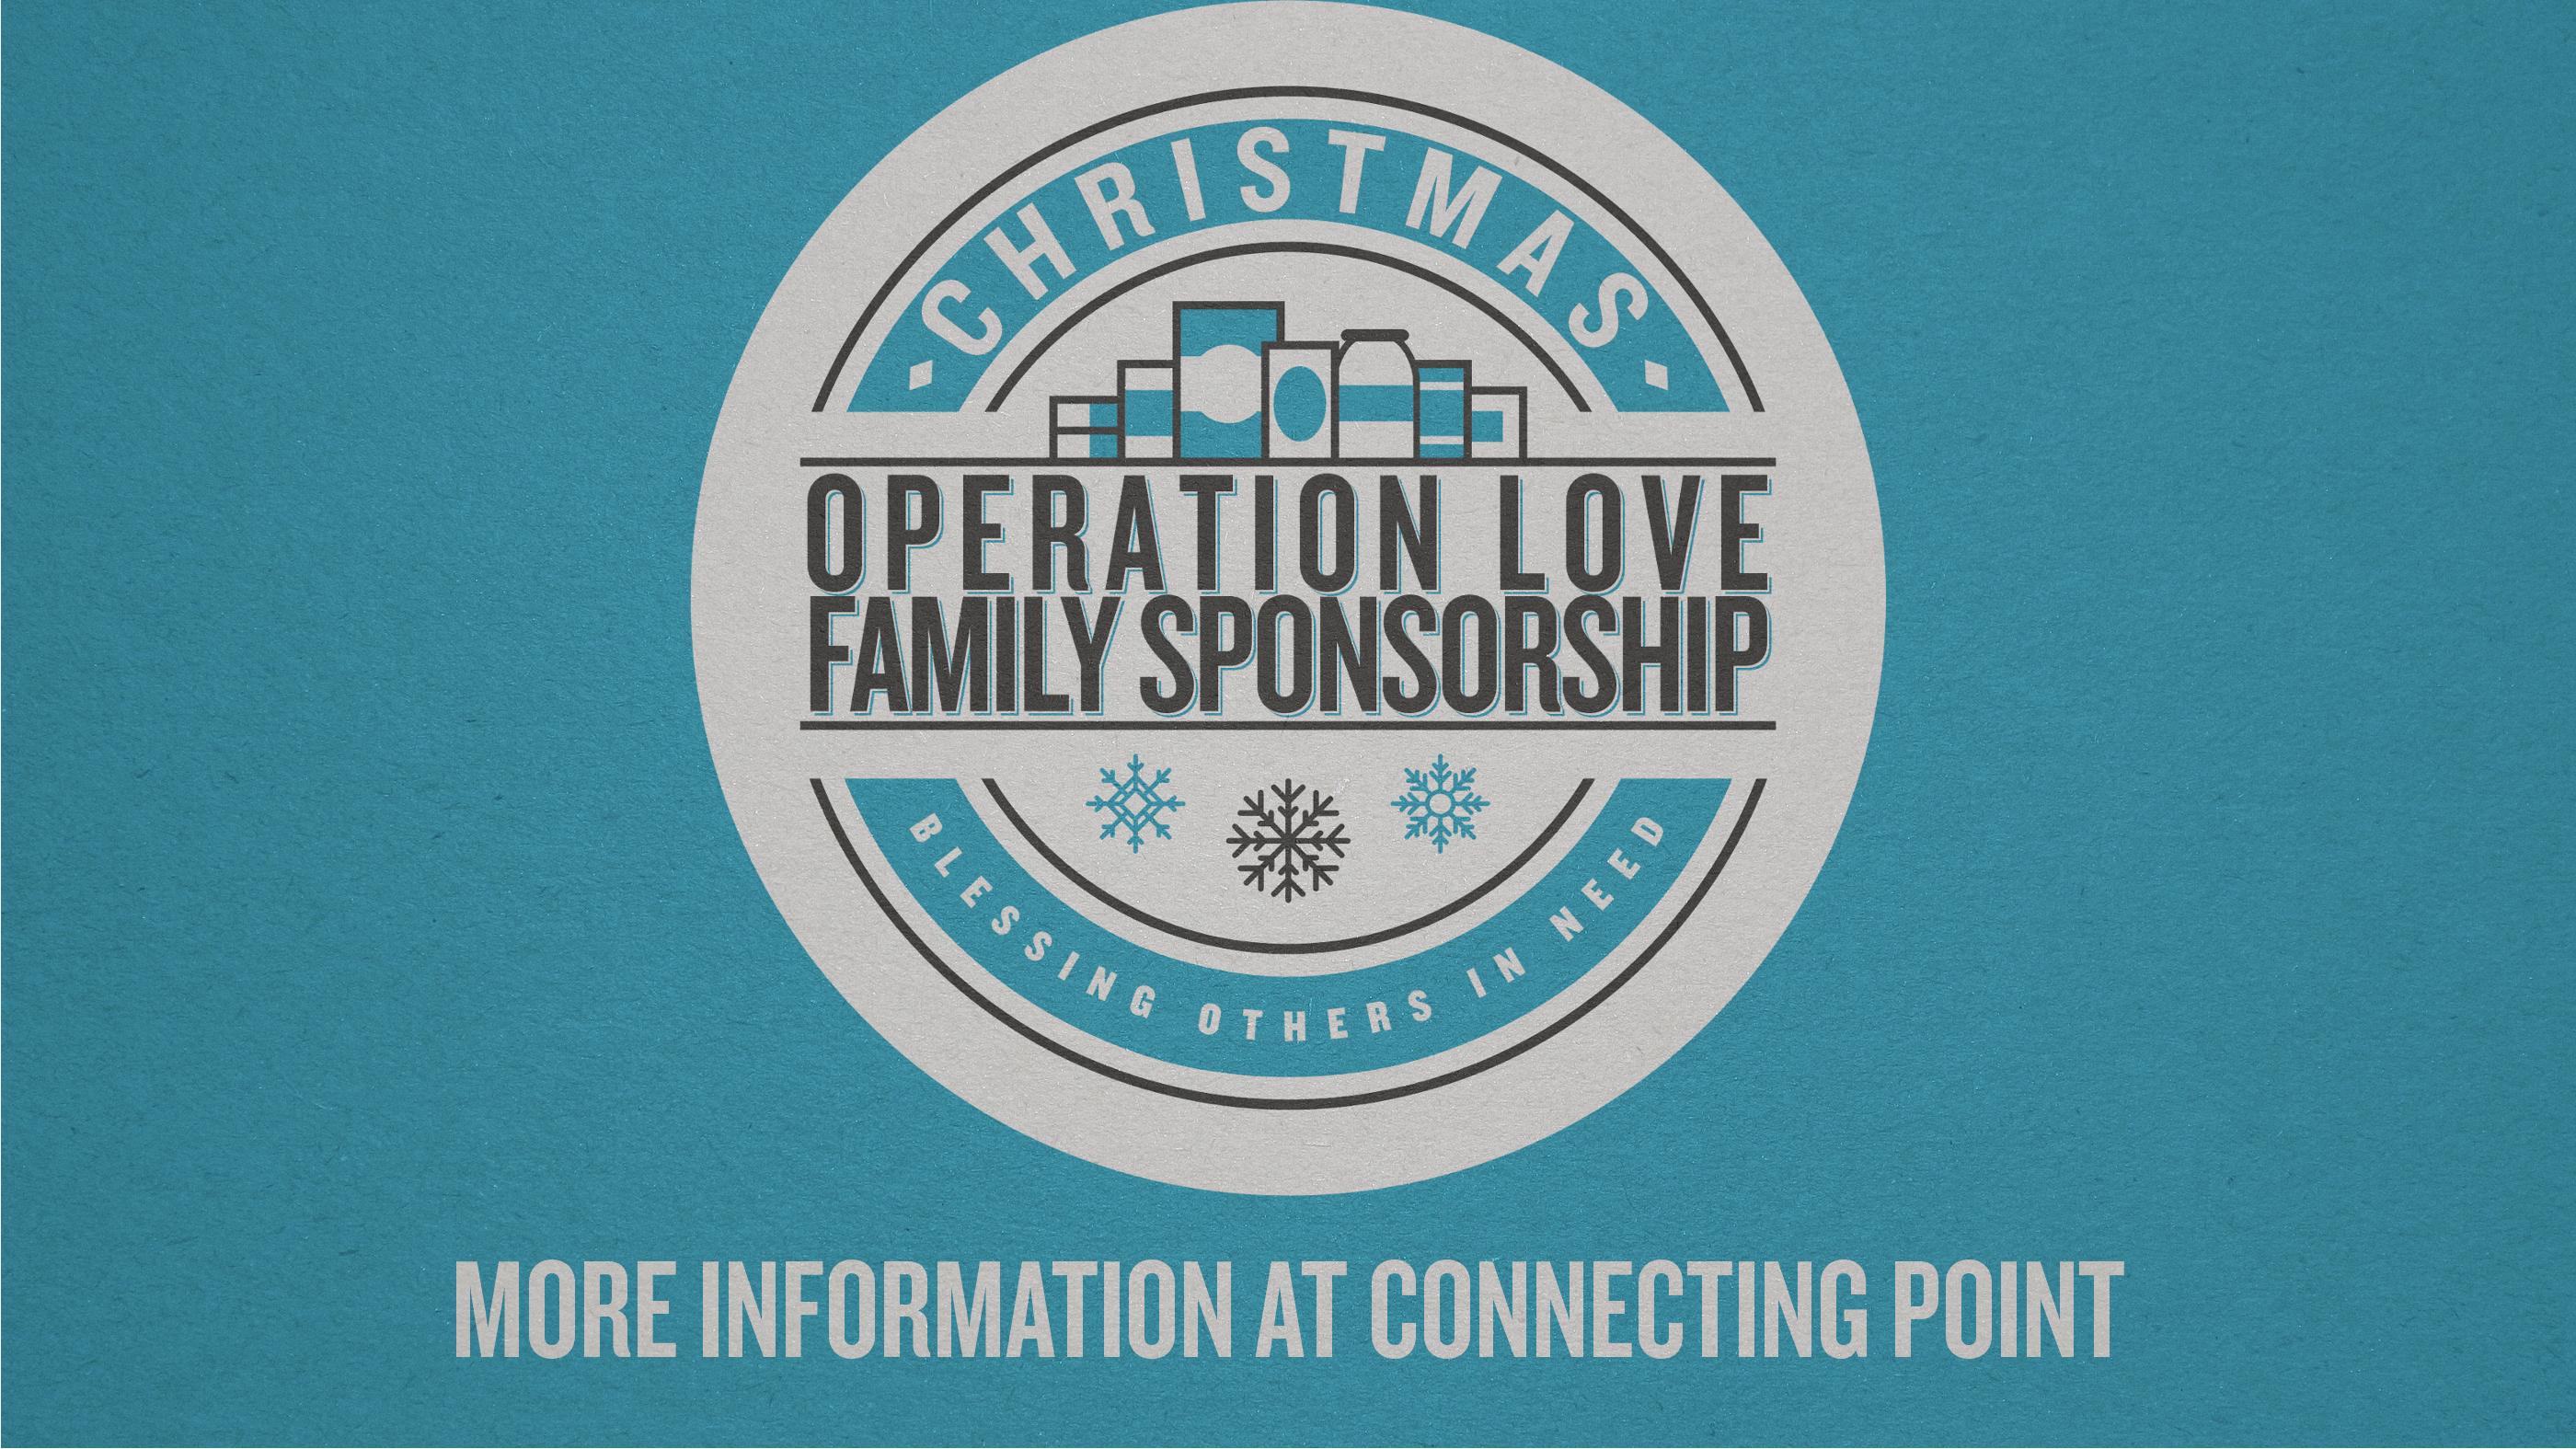 operation-love-family-sponsorship